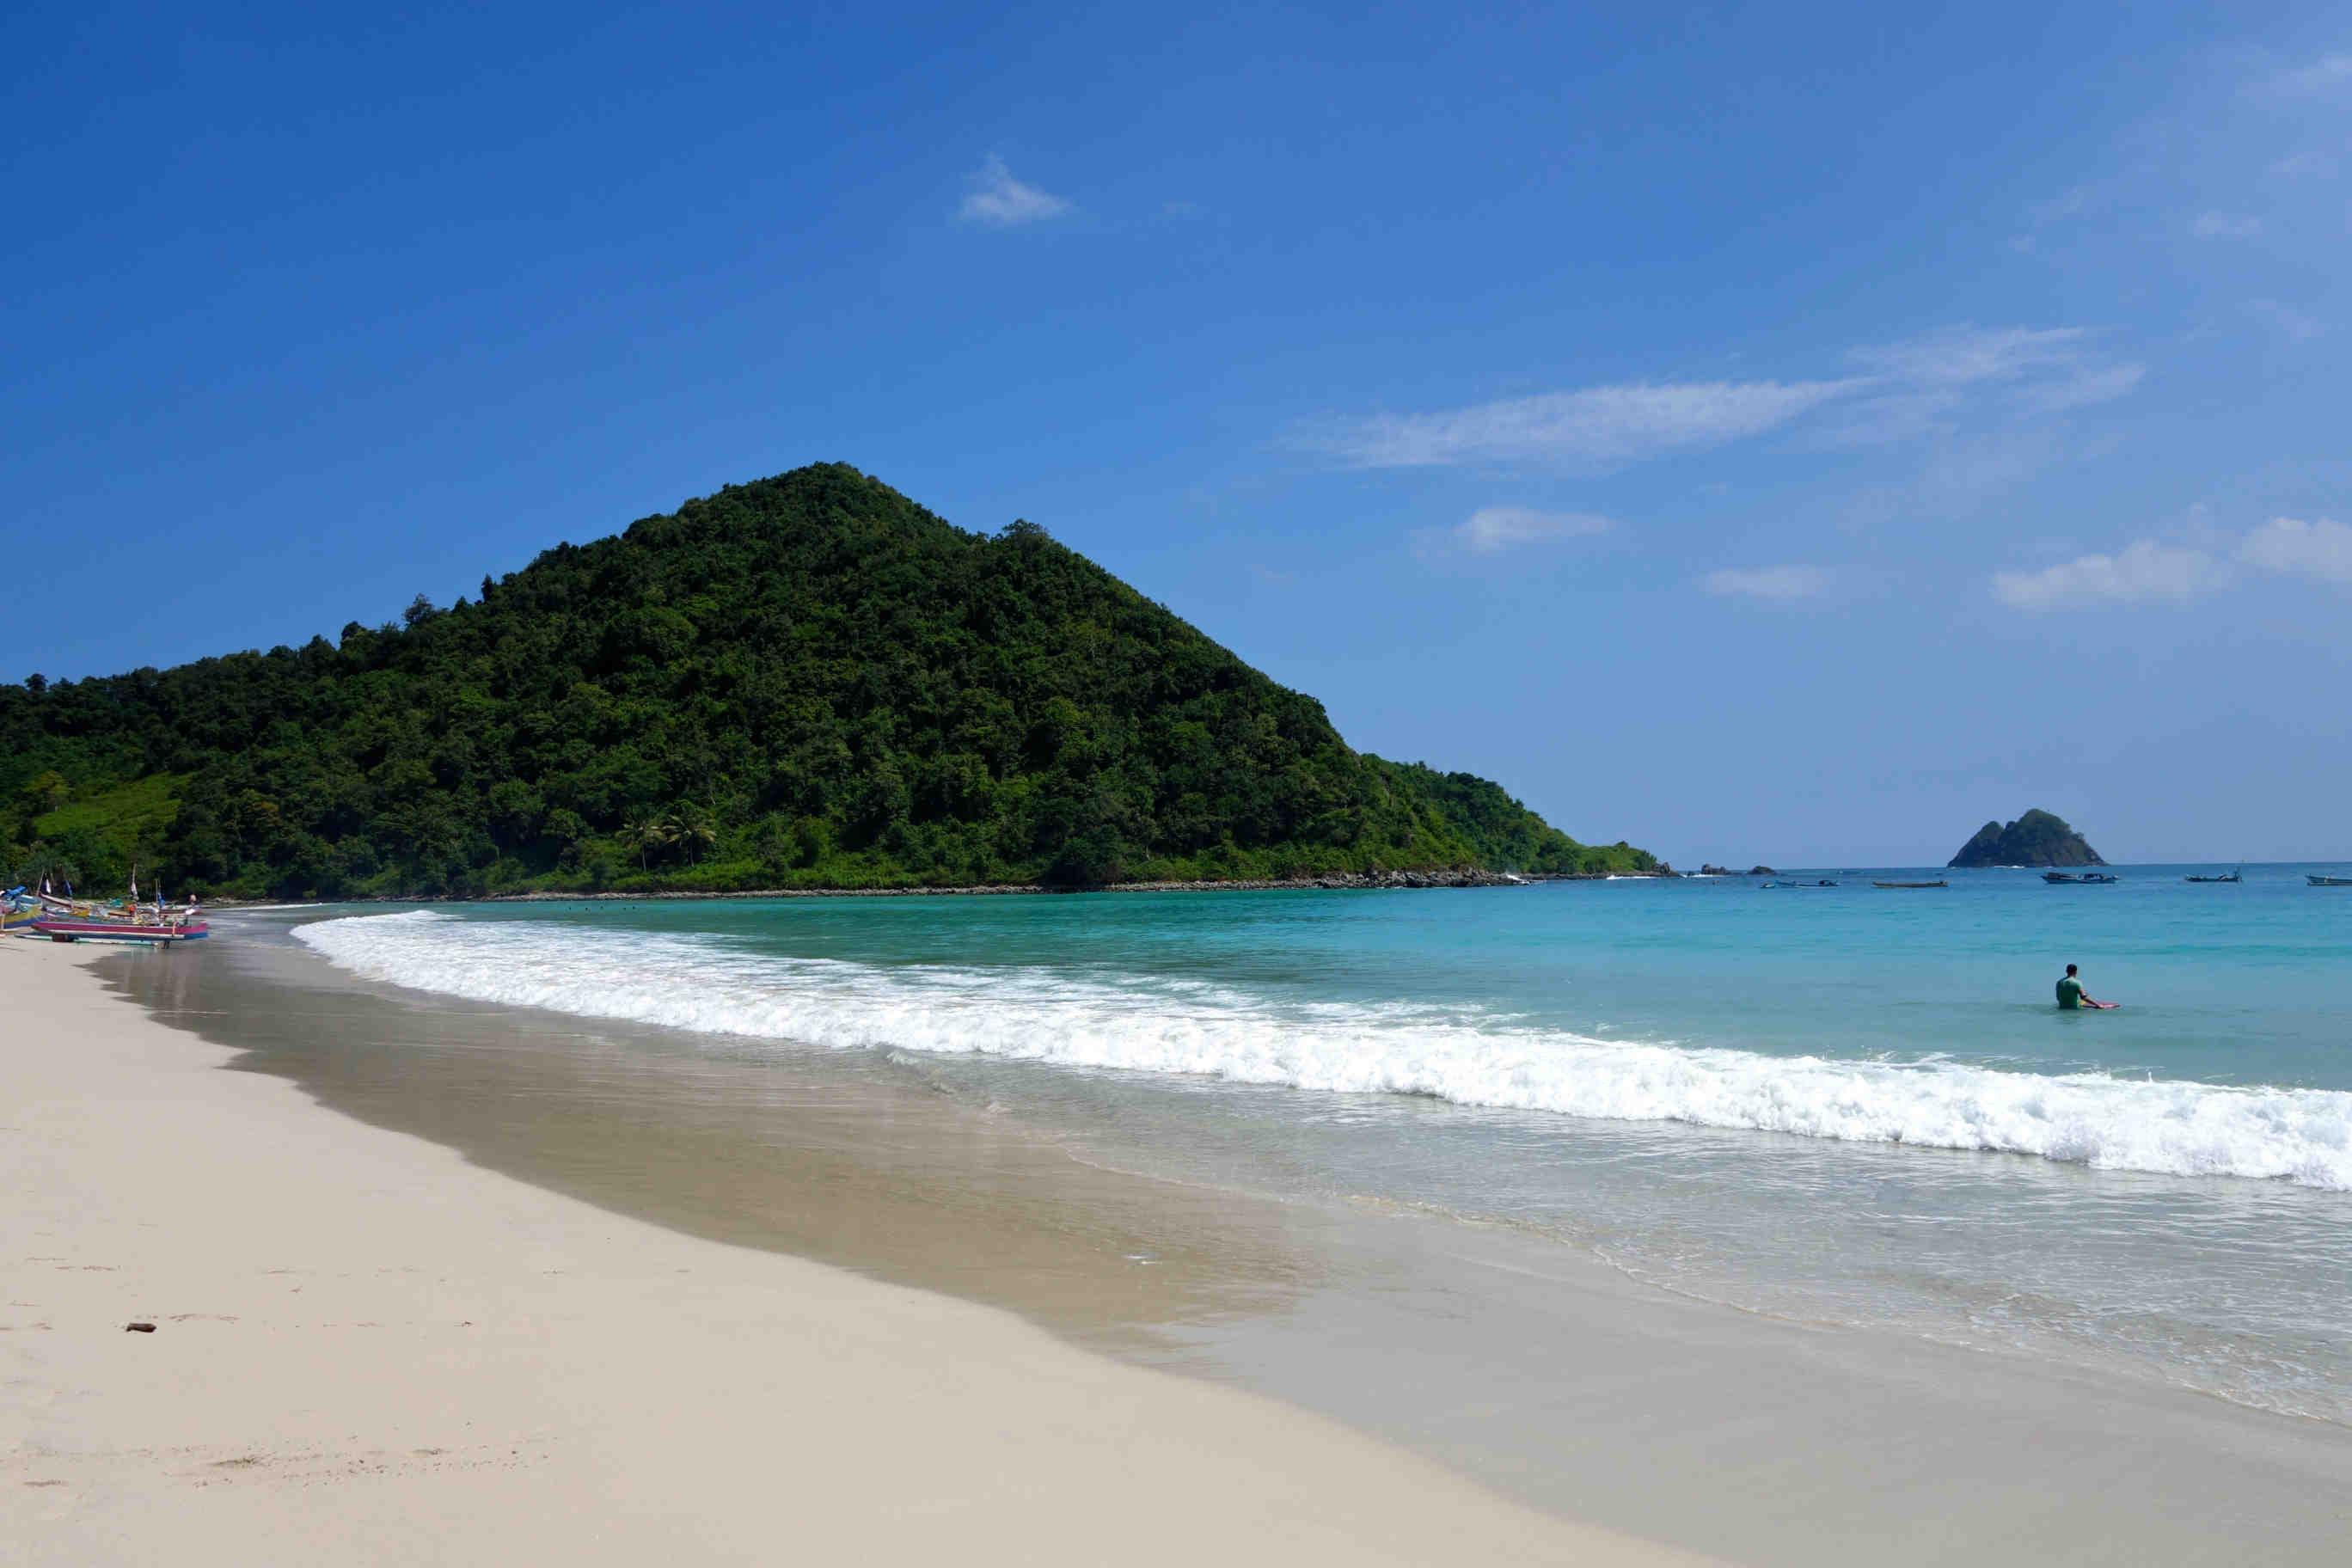 Tempat Wisata Lombok - Pantai Gili Trawangan